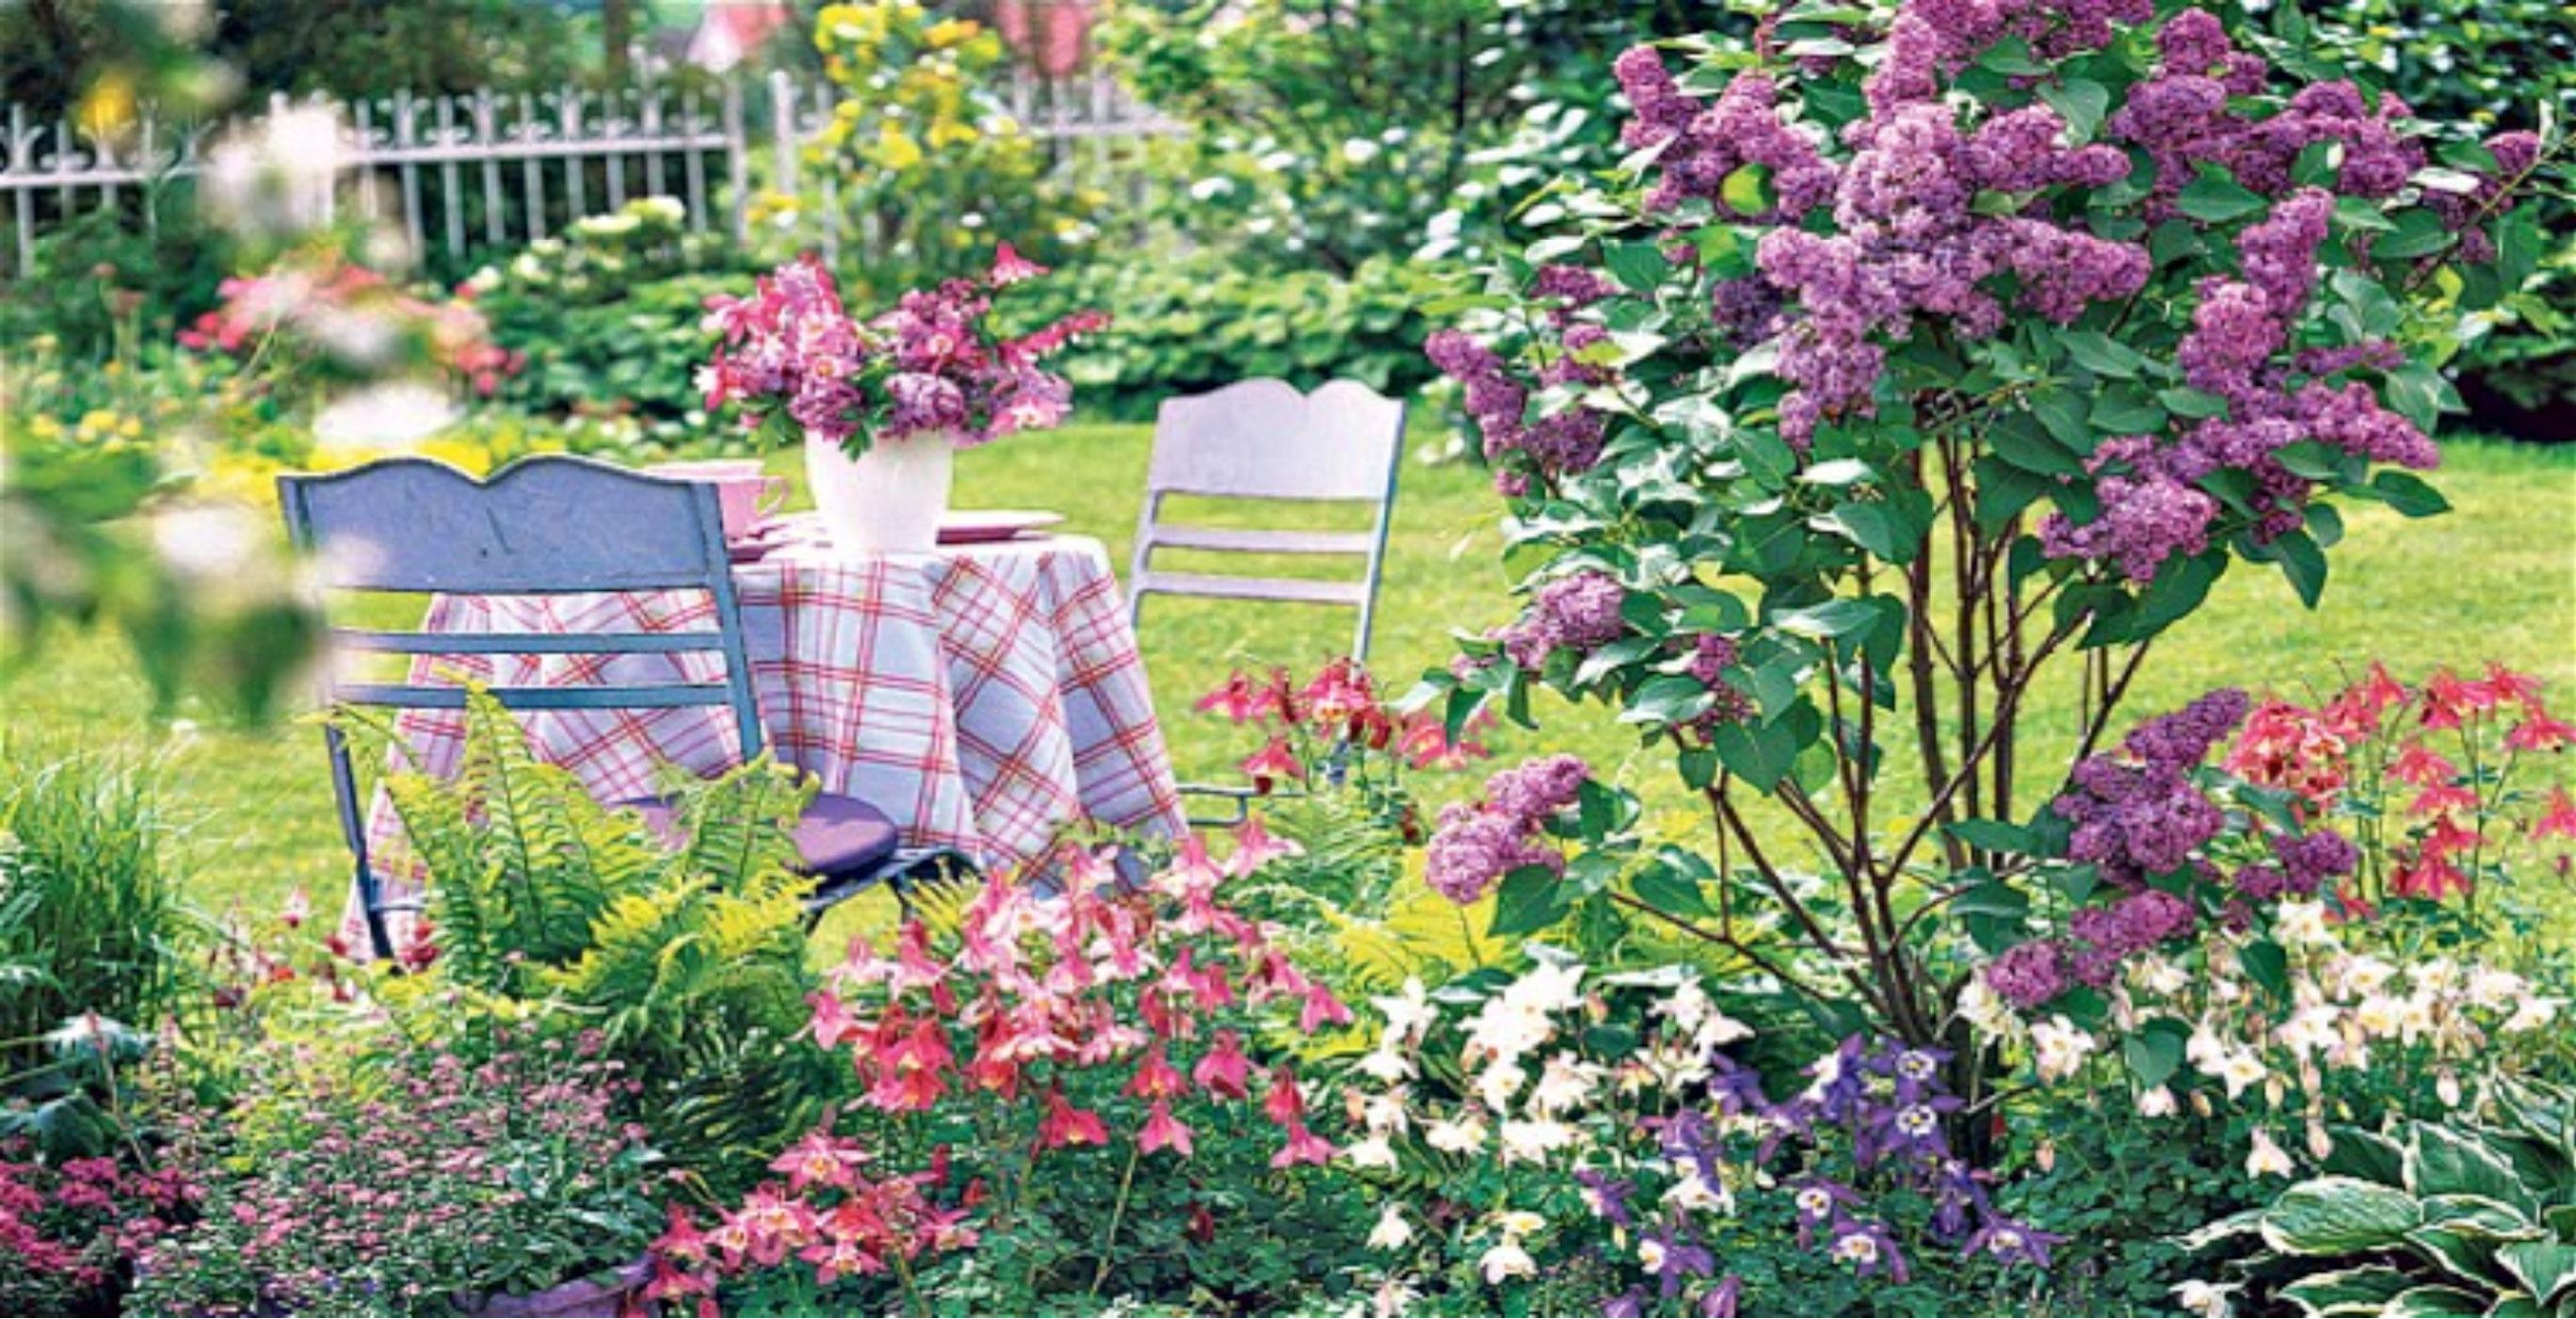 lilac bushes